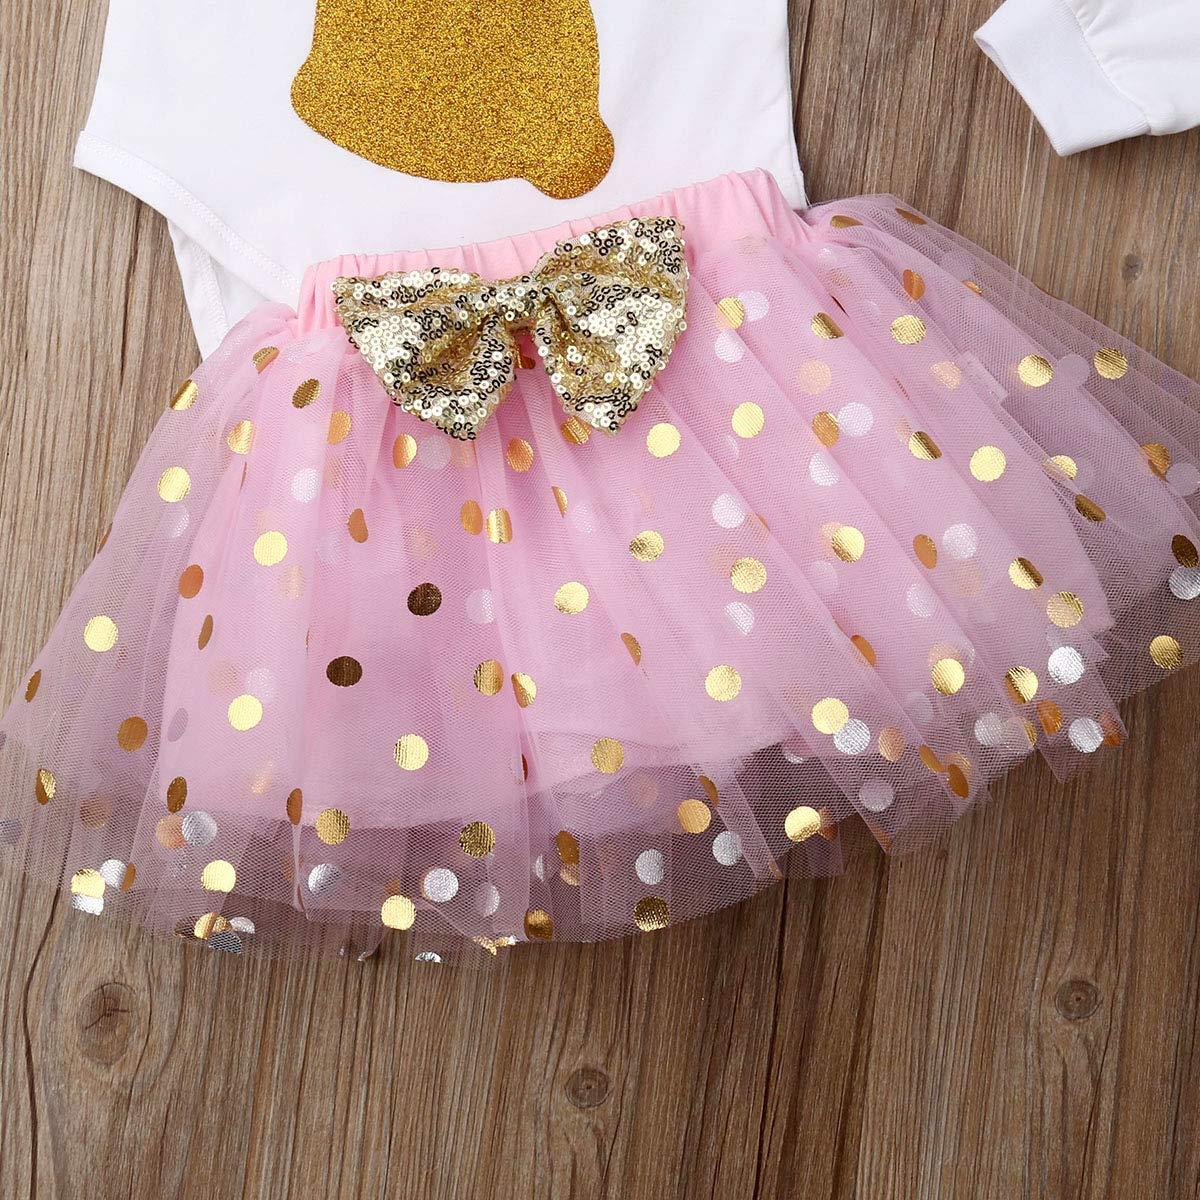 Dot Tulle Skirt Set 3PCS Newborn Infant Baby Girl Easter Outfit Summer Clothes Bunny Romper Leg Warmer